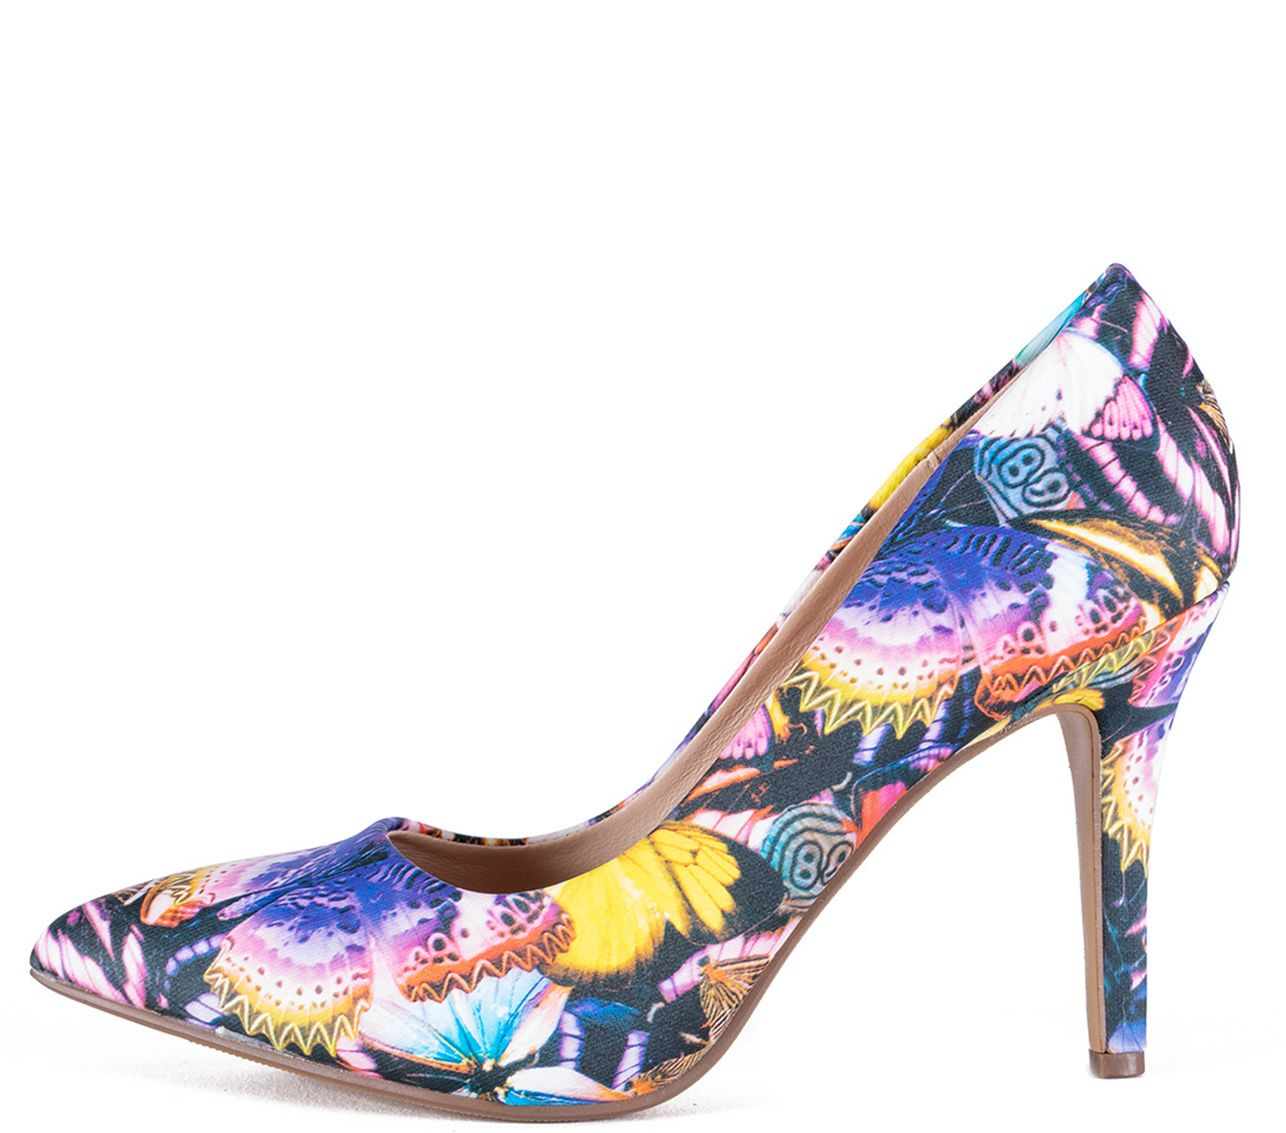 Zapato de fiesta mariposas